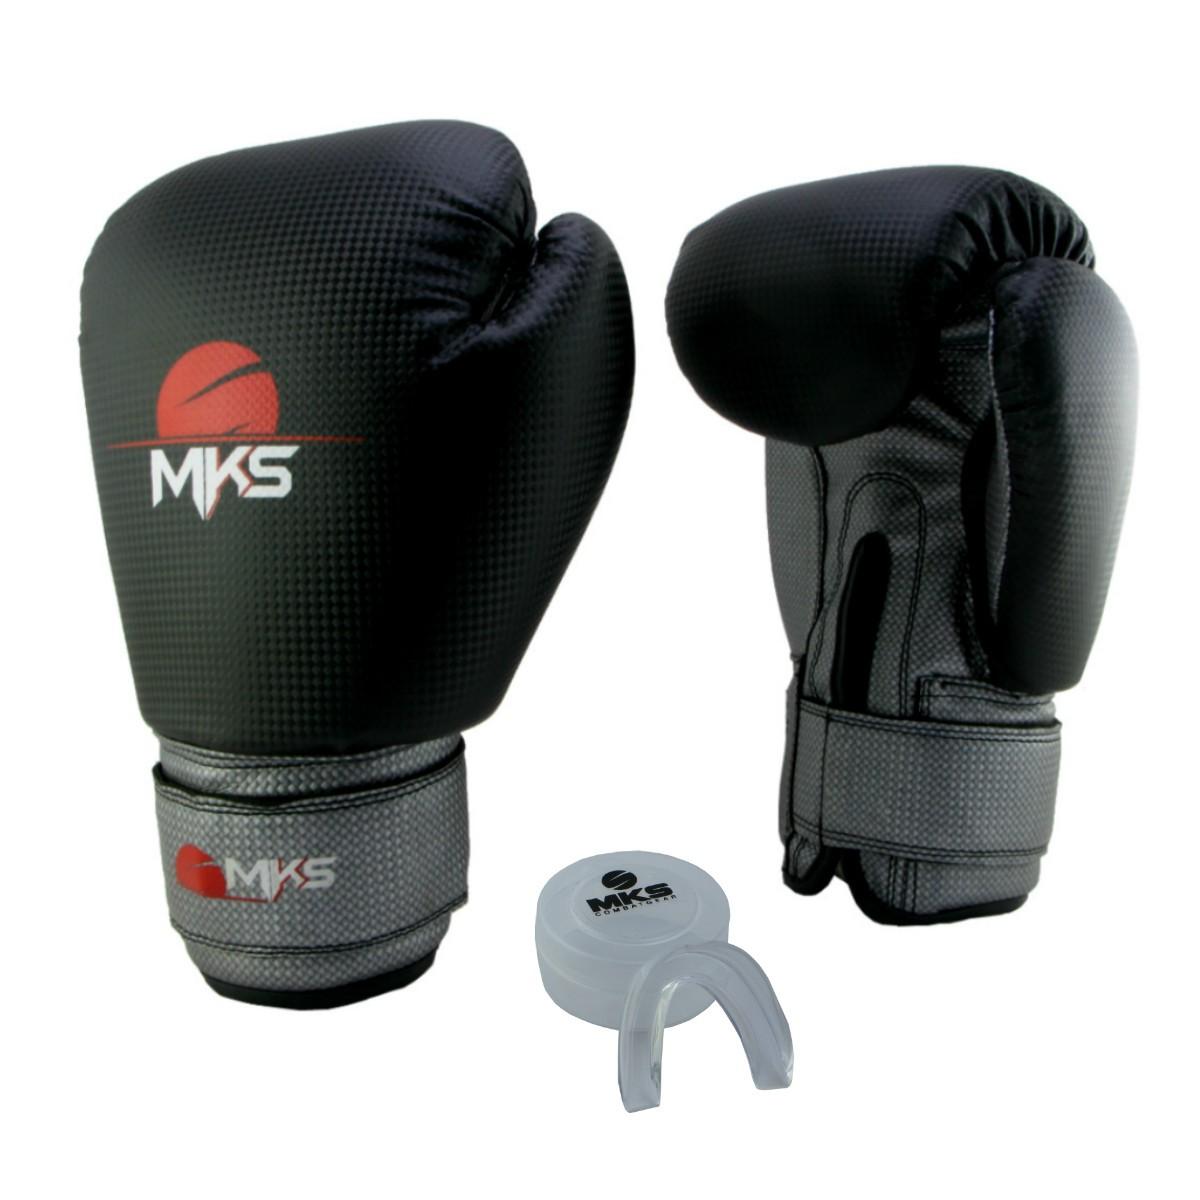 Luva de Boxe Prospect MKS Black & Silver 16 oz + Protetor Bucal